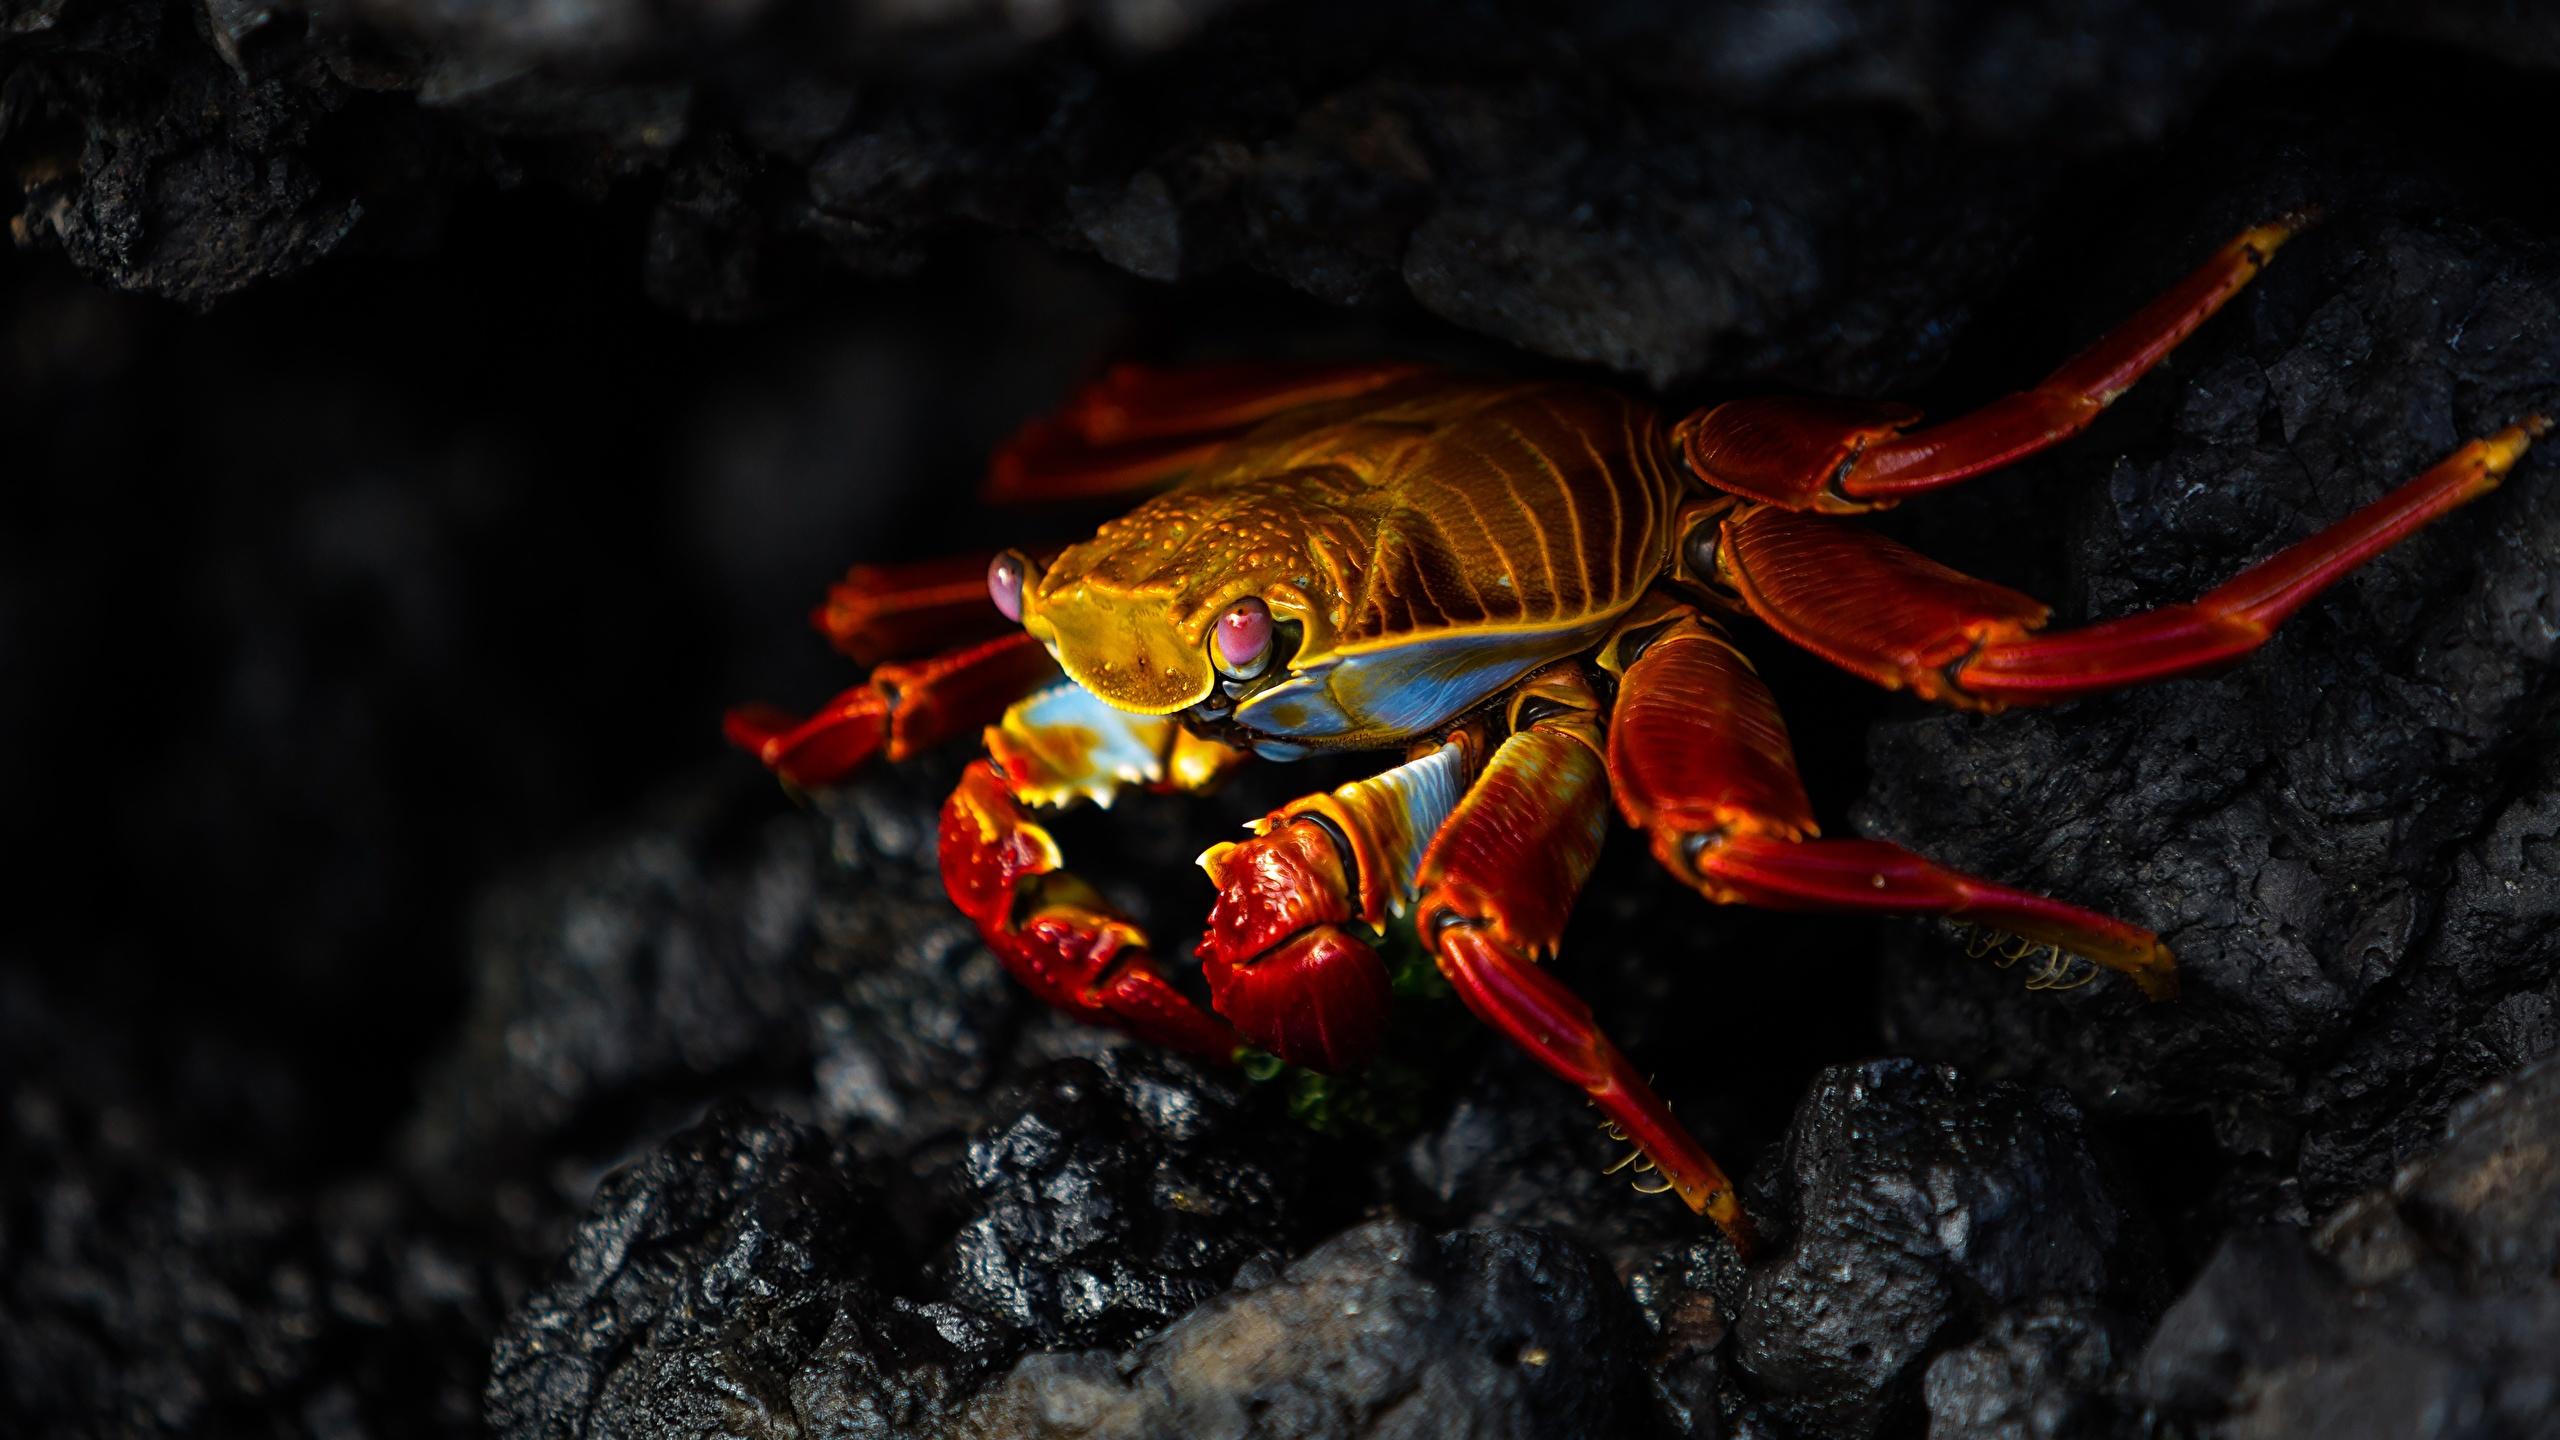 Image Crabs - Animals Animals Closeup 2560x1440 animal